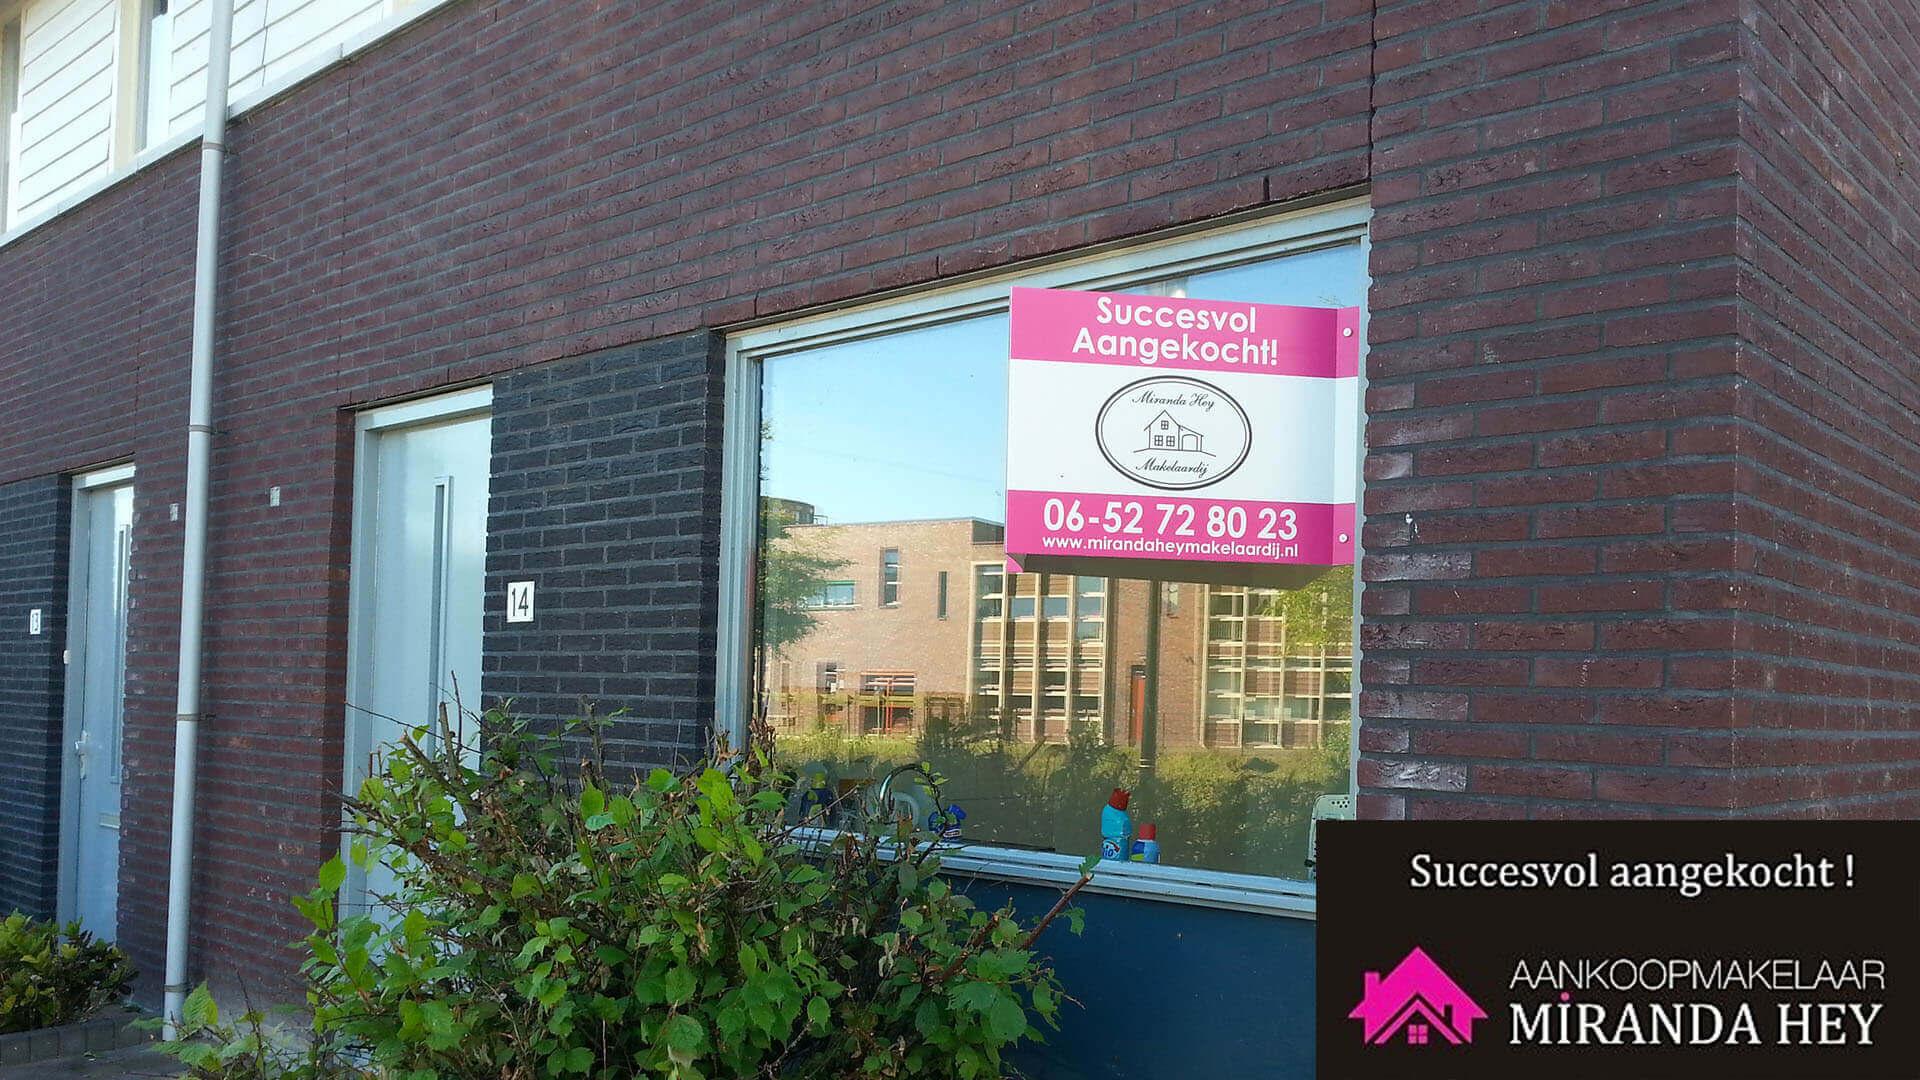 gratis chat nl Alkmaar